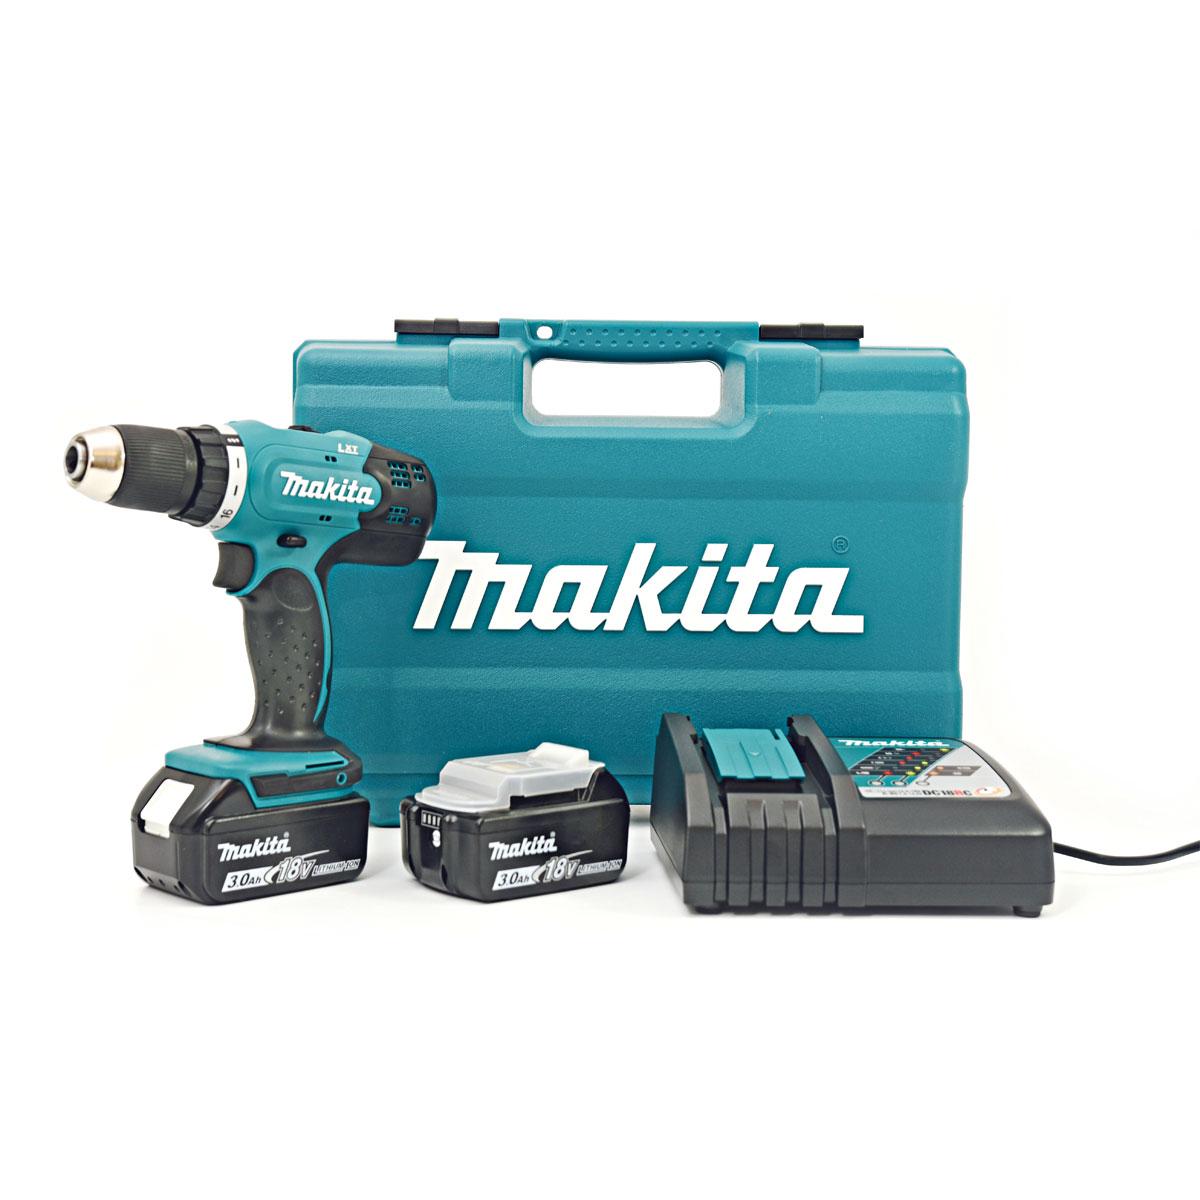 Makita DHP 453 RFE 18 V Li-Ion Akku Schlagbohrschrauber im Transportkoffer + 2 x 3Ah Akku für 162€ [Contorion]